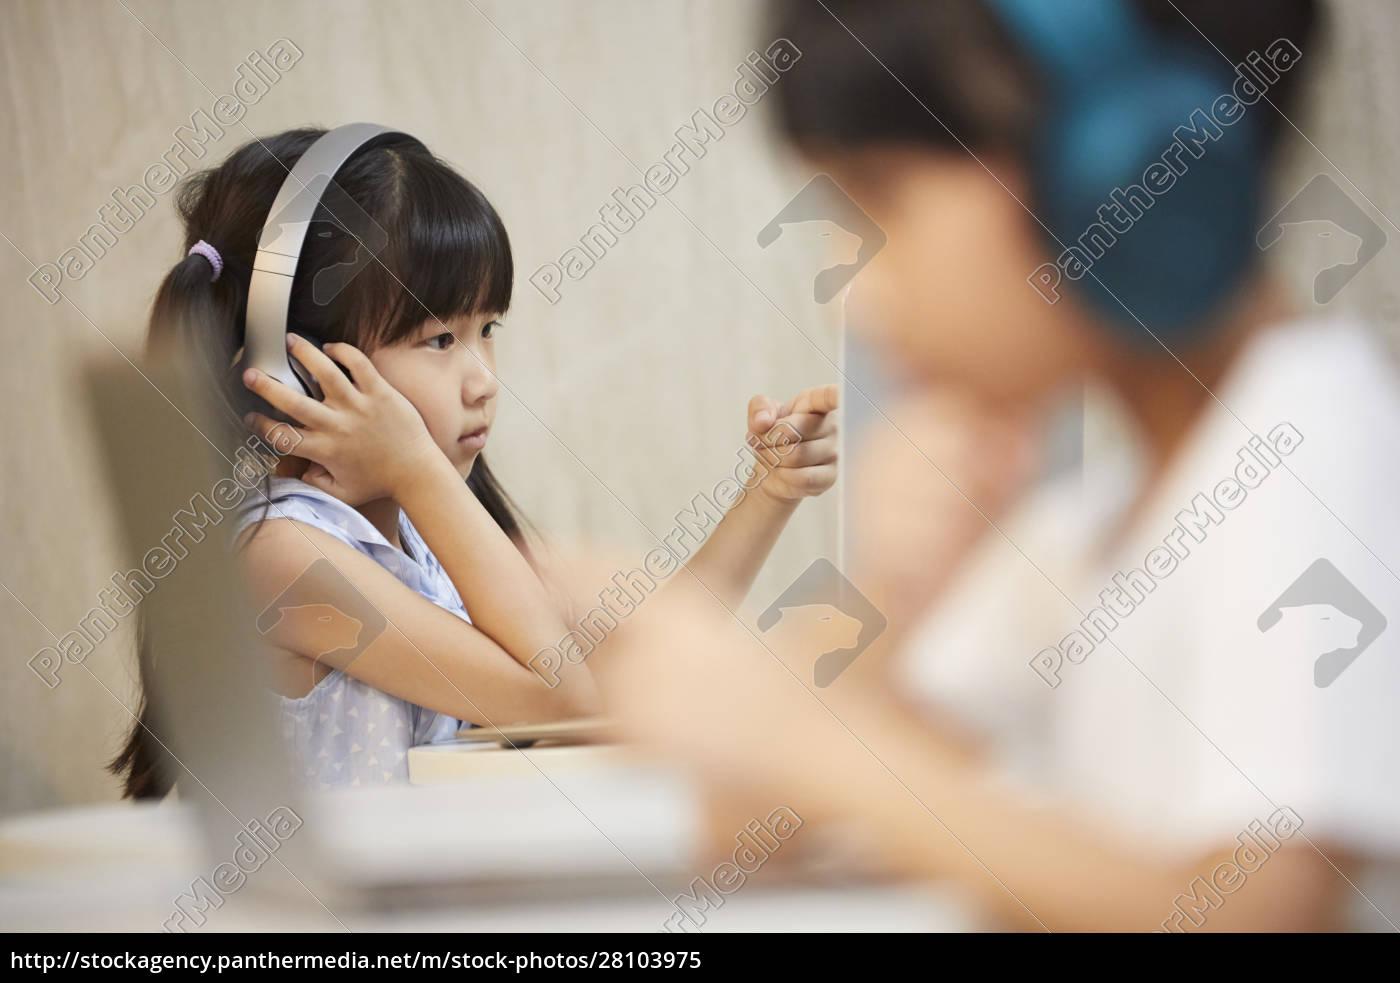 schoolchild, school, life - 28103975